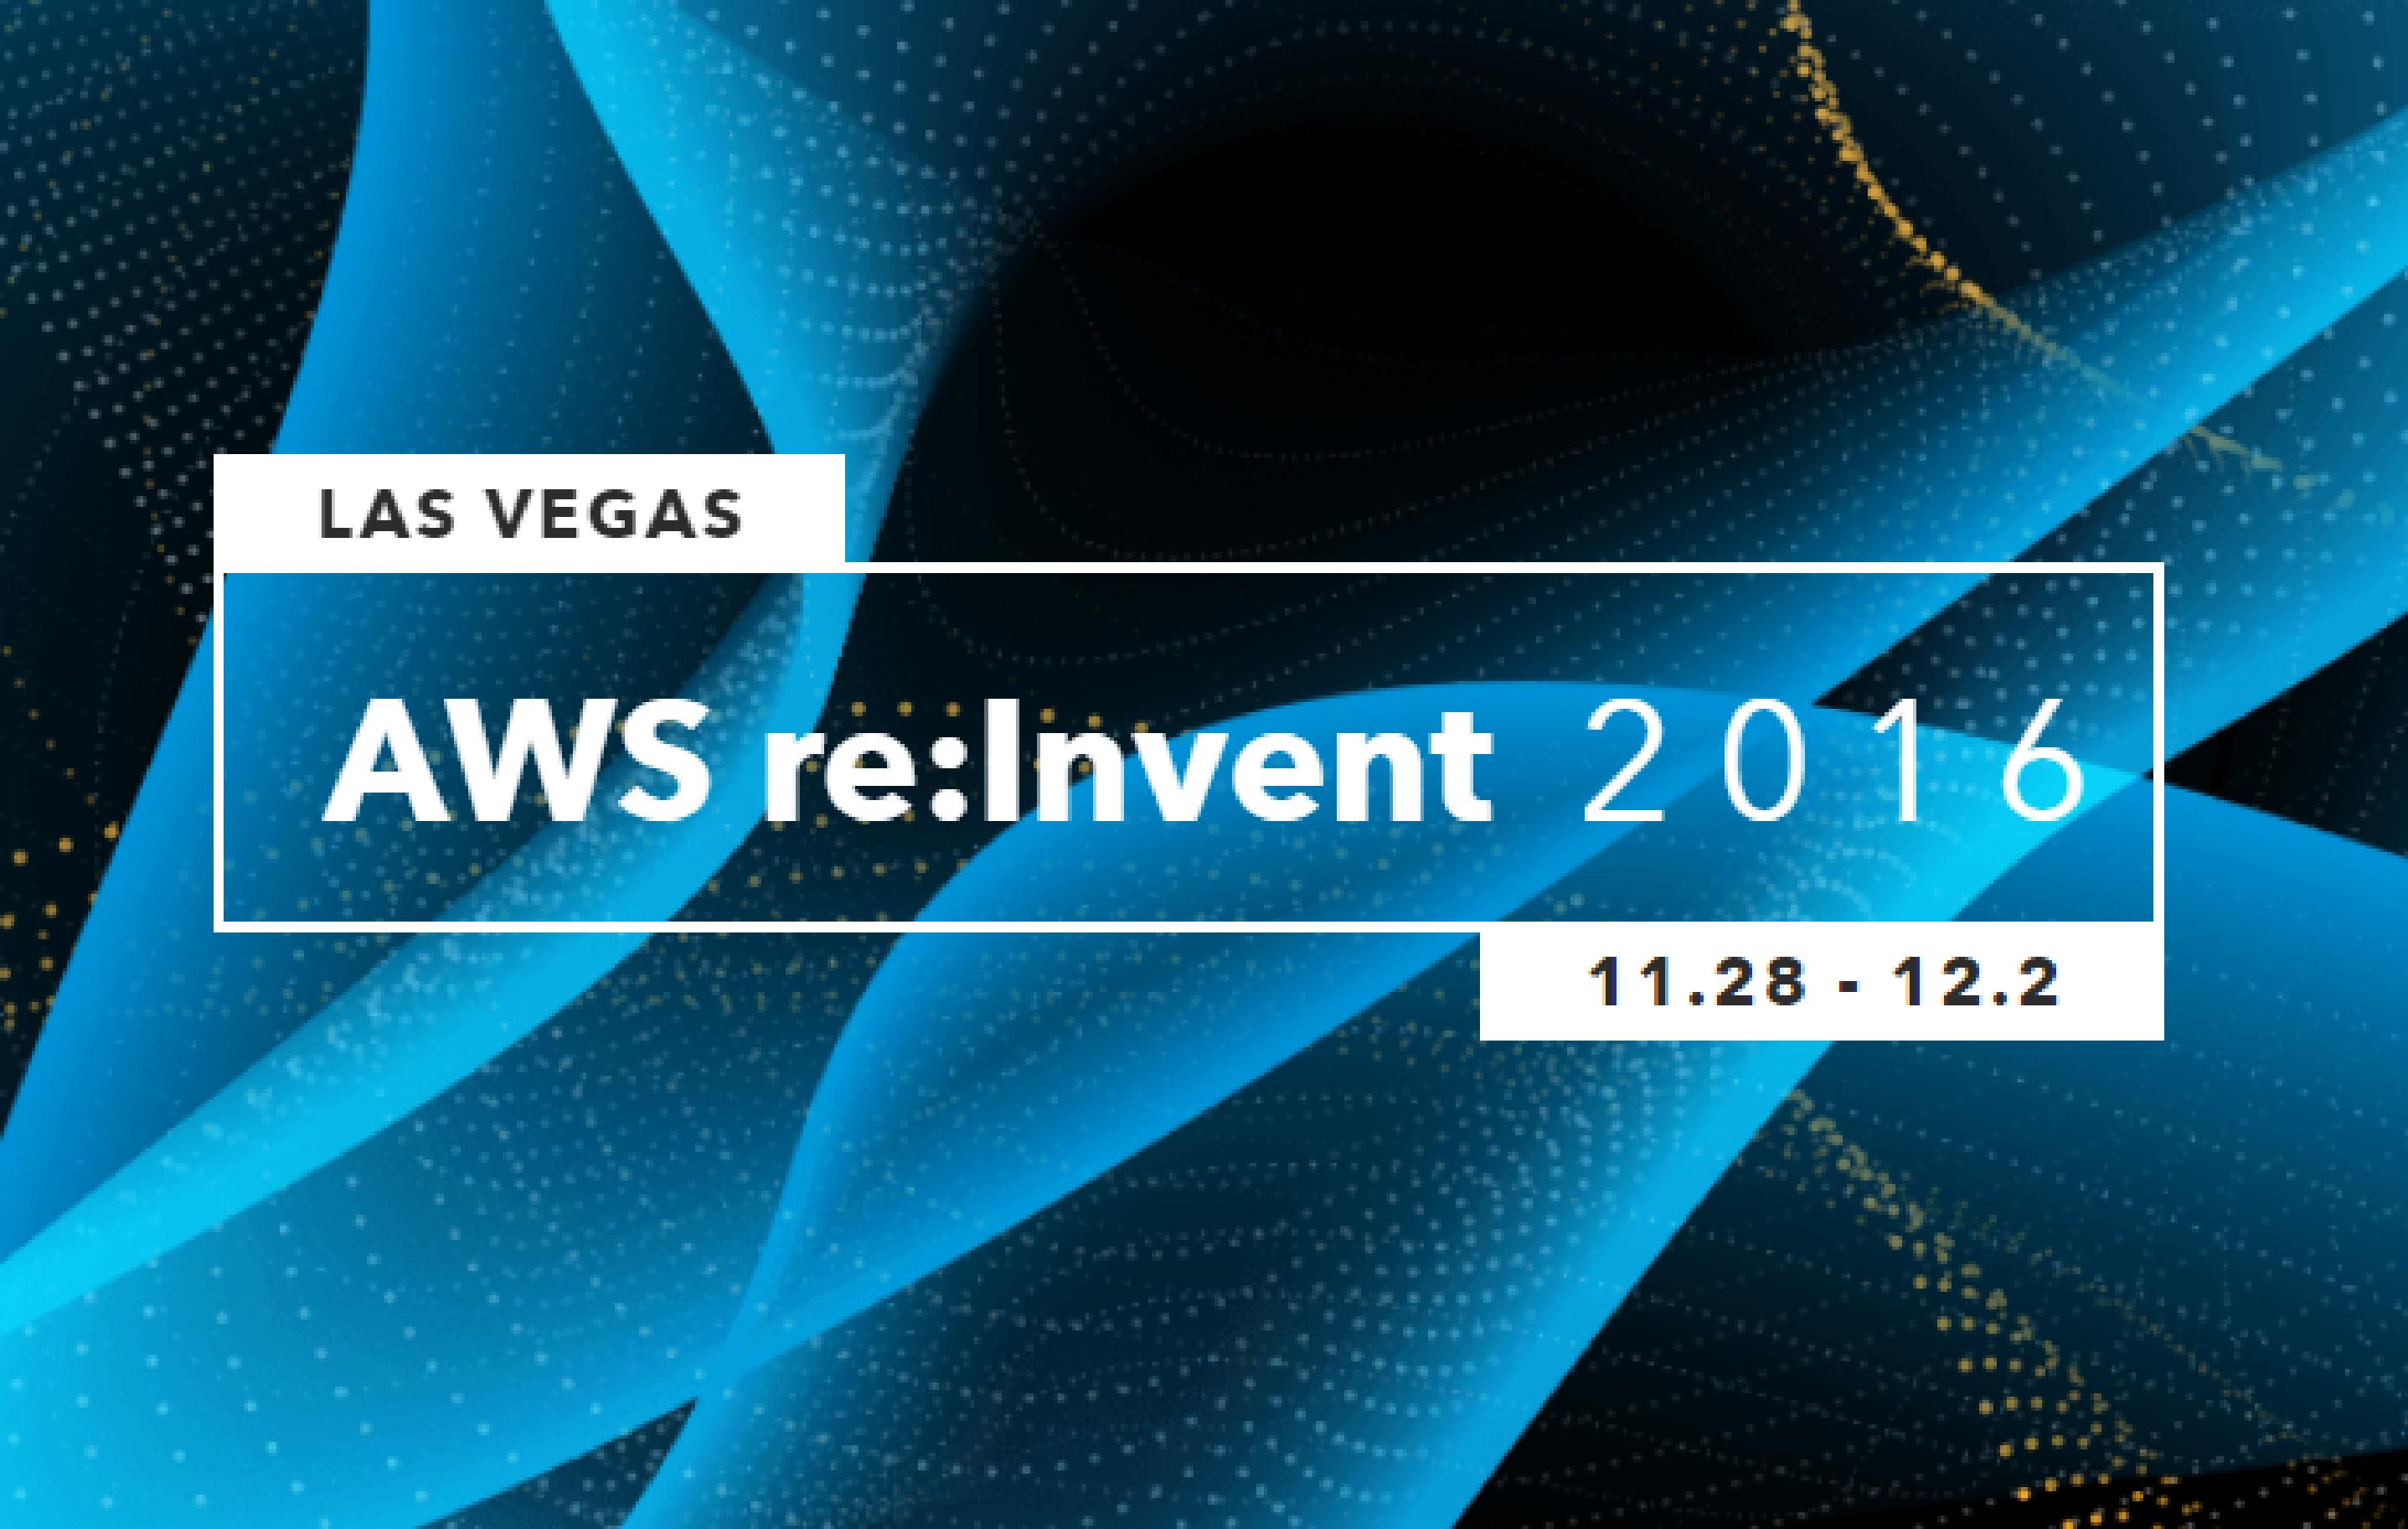 reinvent-2016-matillion-01